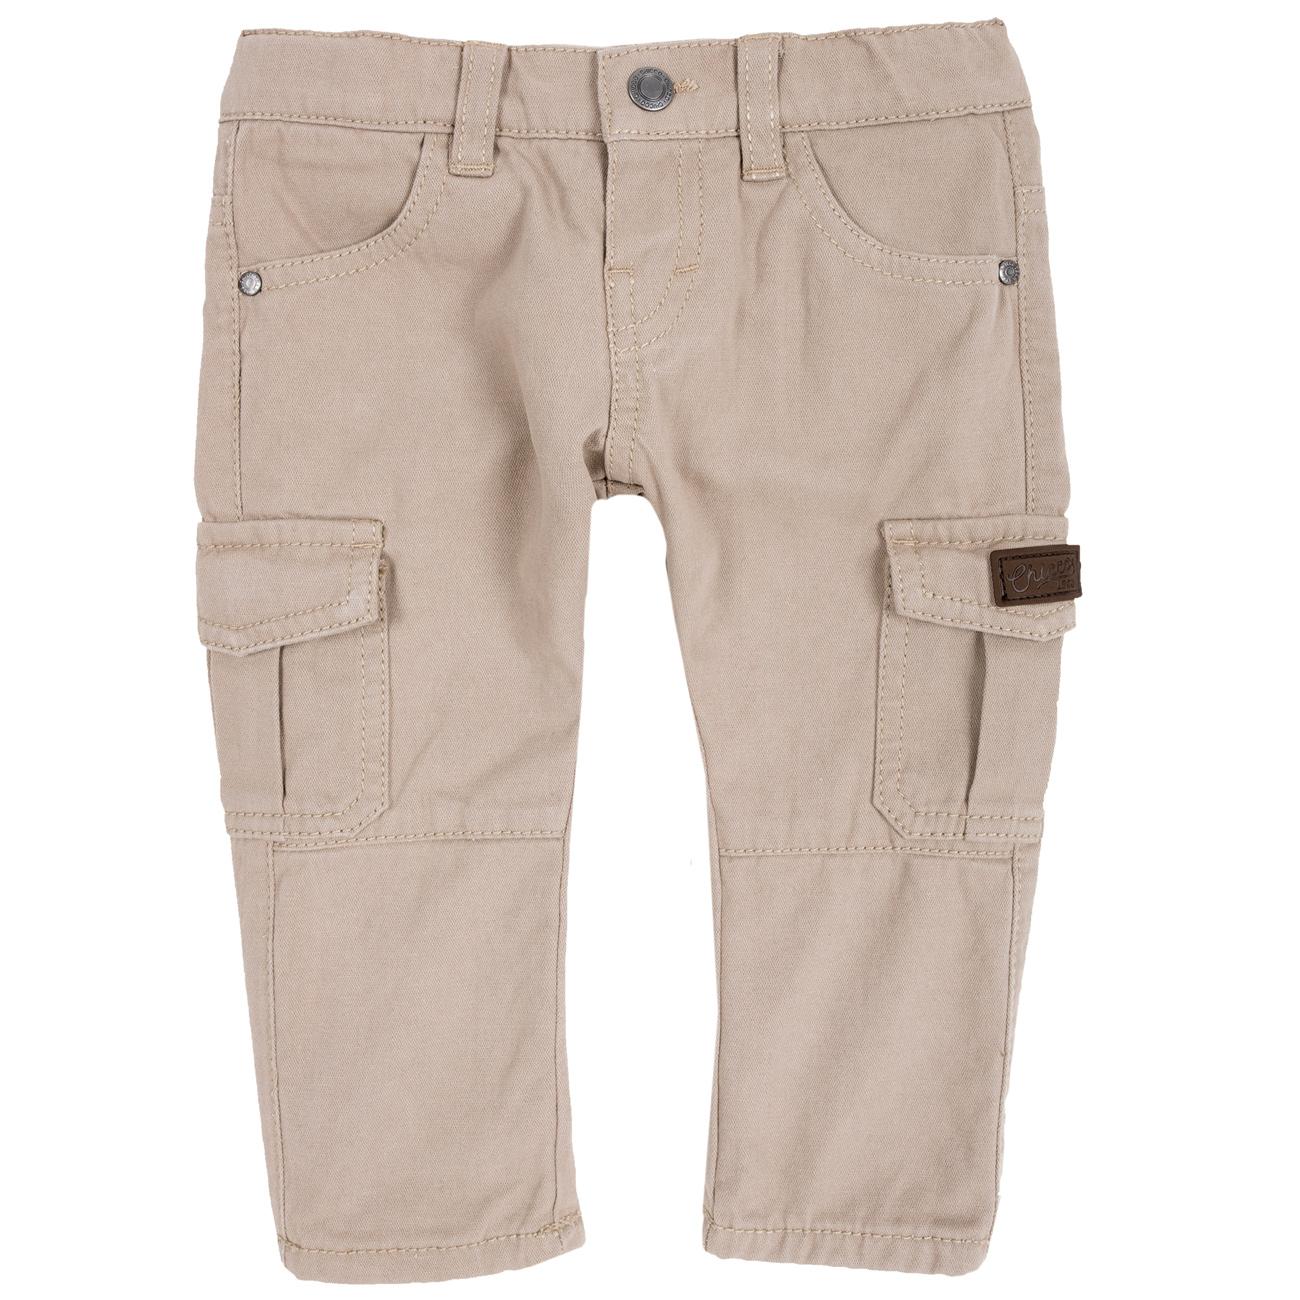 Pantalon Copii Chicco Maro Deschis 86